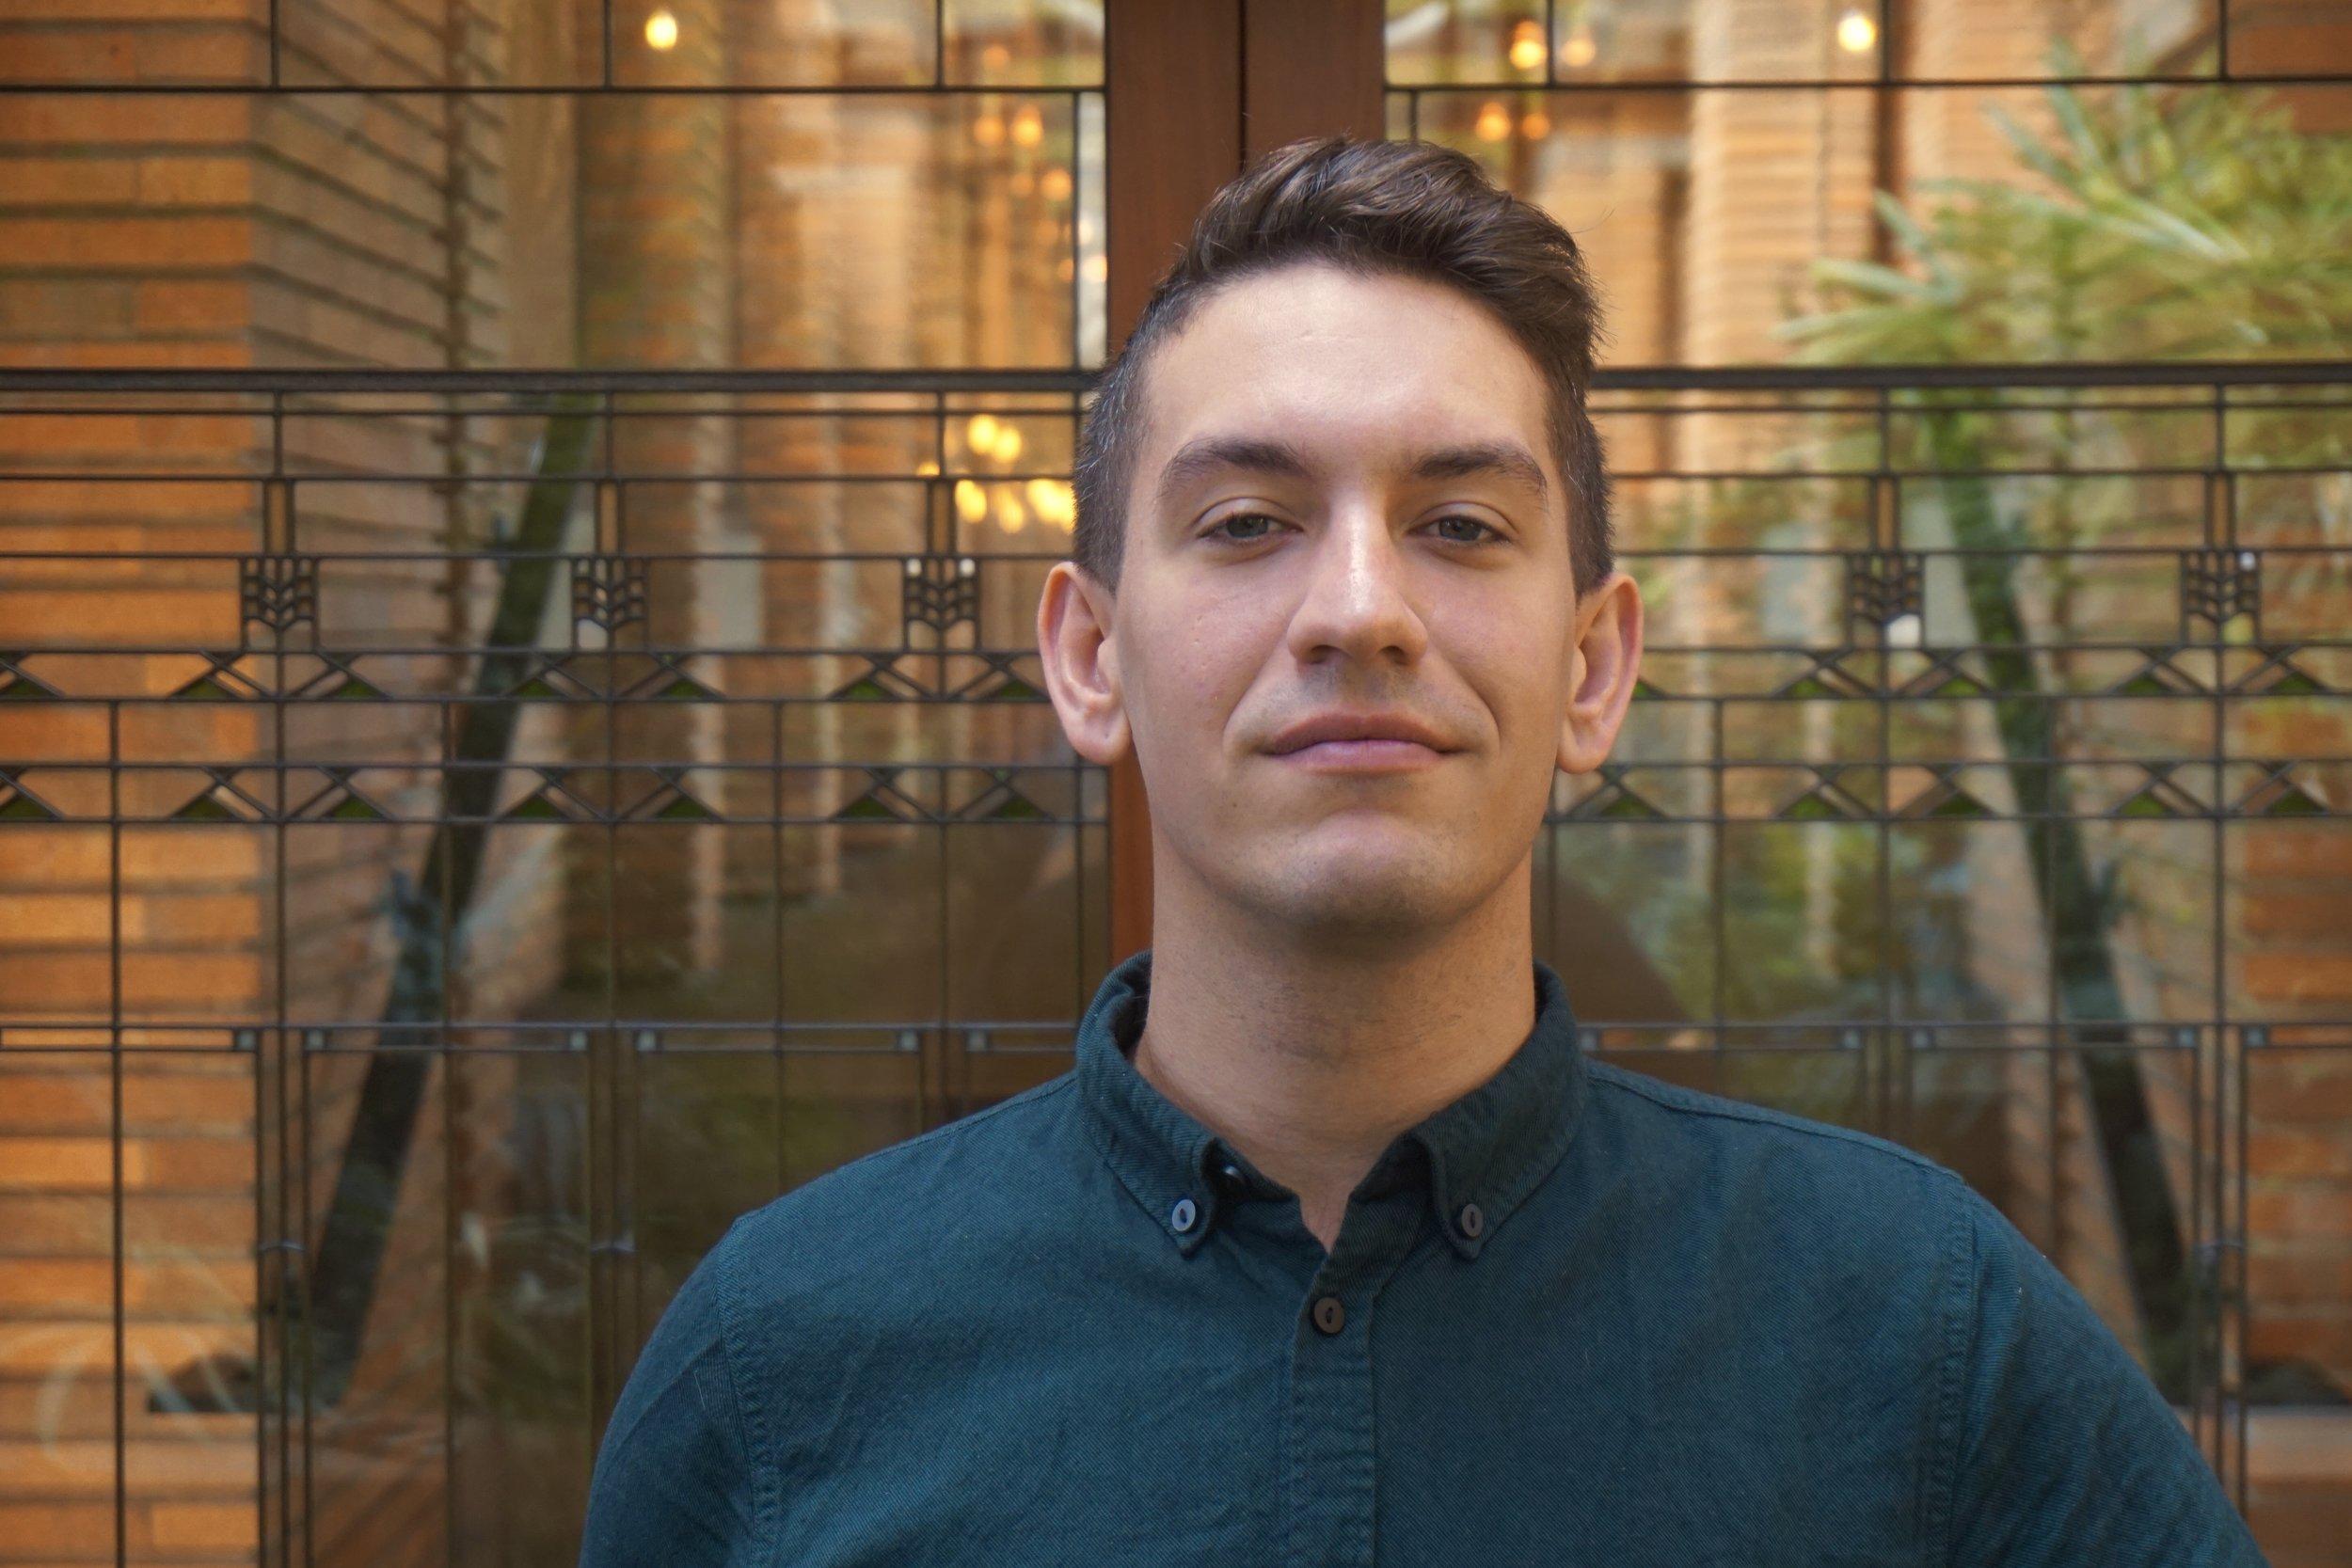 Jacob Slattery - Digital Media and Promotion Manager of The Leonard Bernstein Office